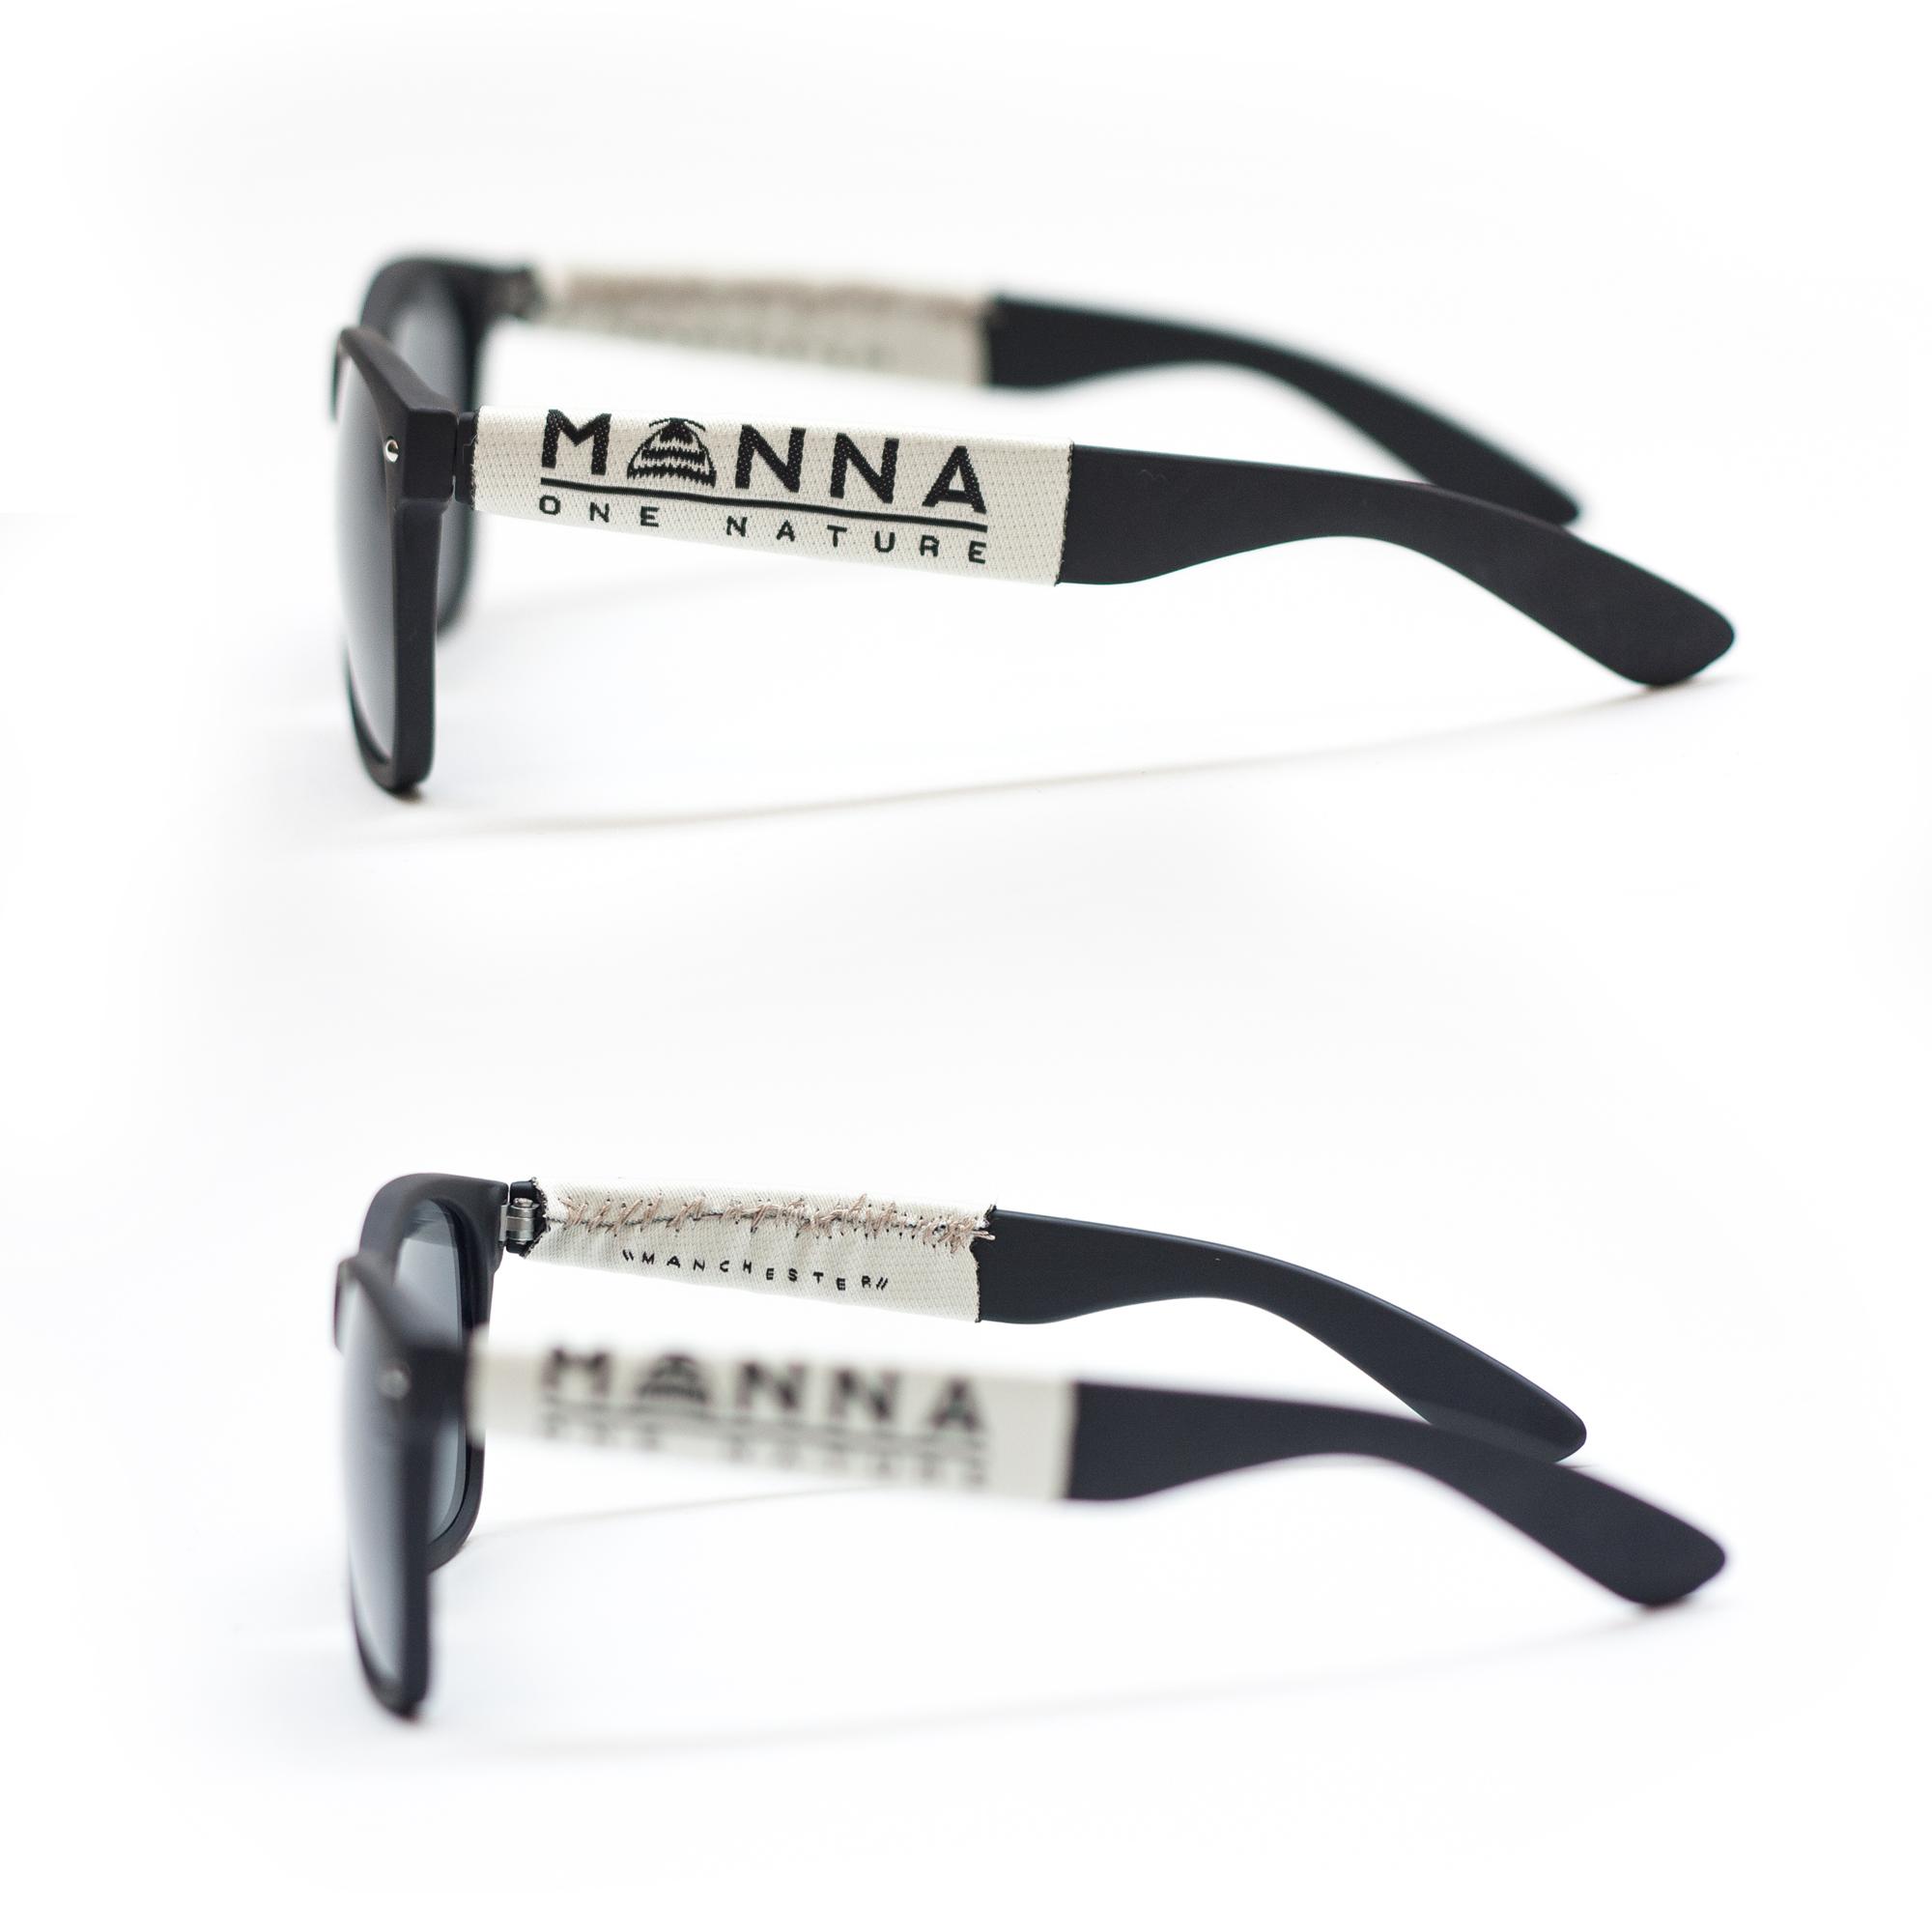 One Nature Sunglasses - 2